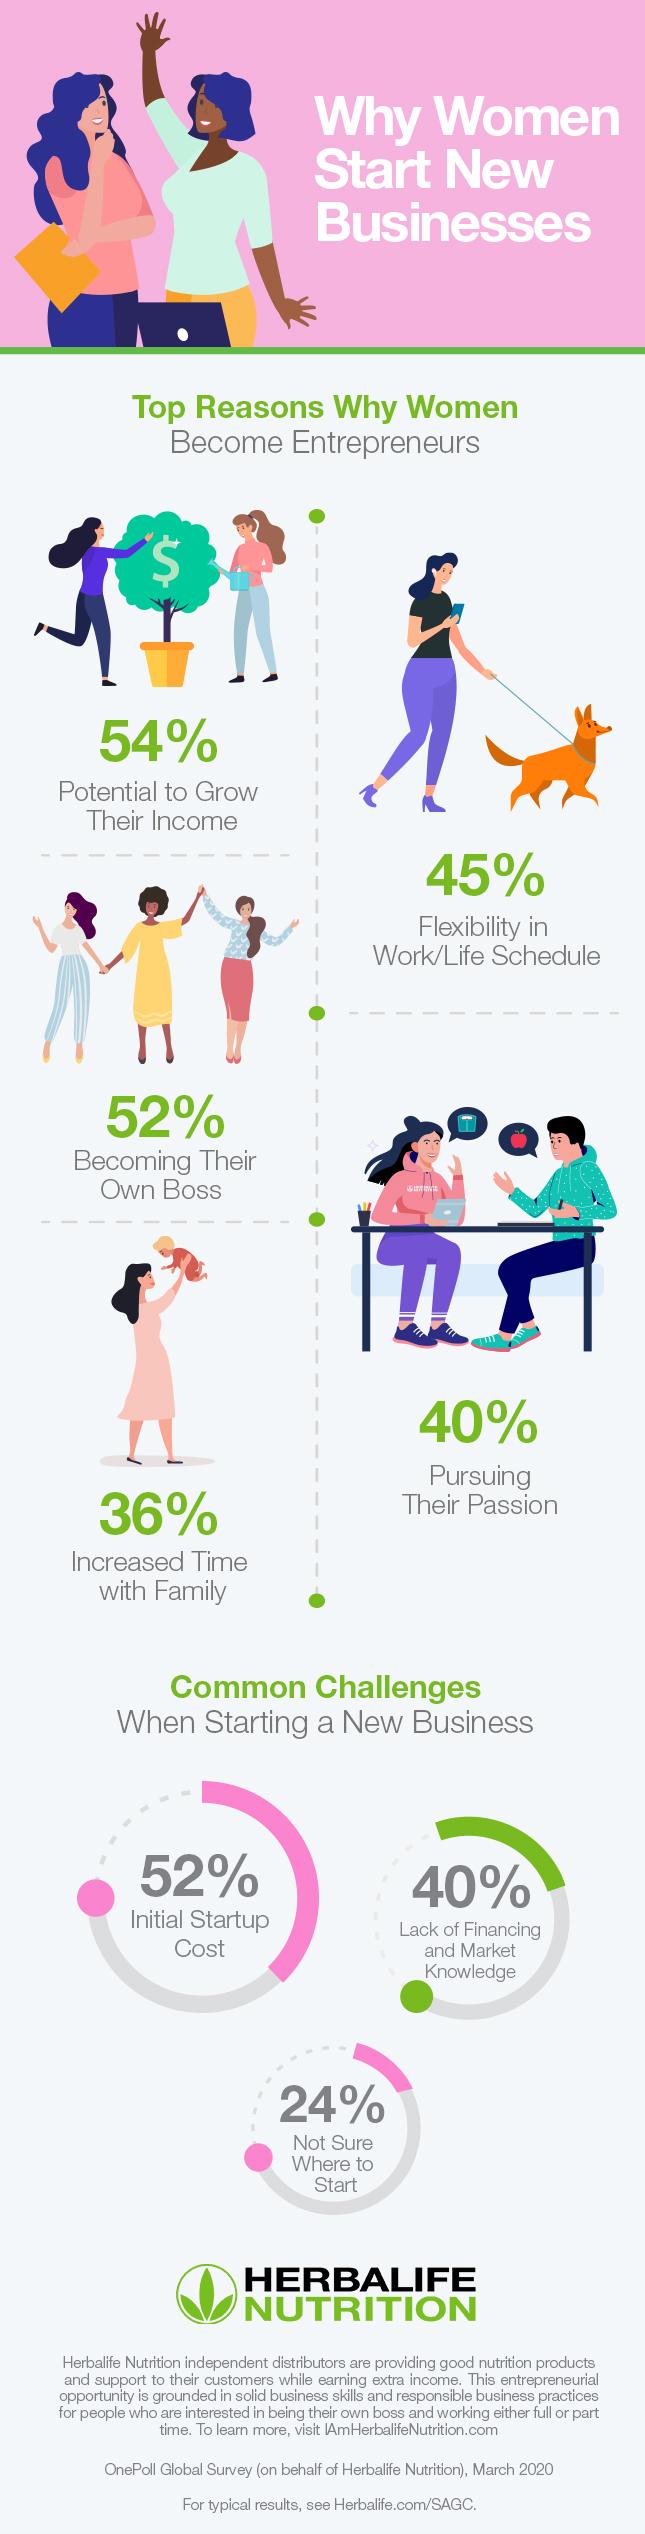 Herbalife_Nutrition_Women_Entreneurship_Infographic